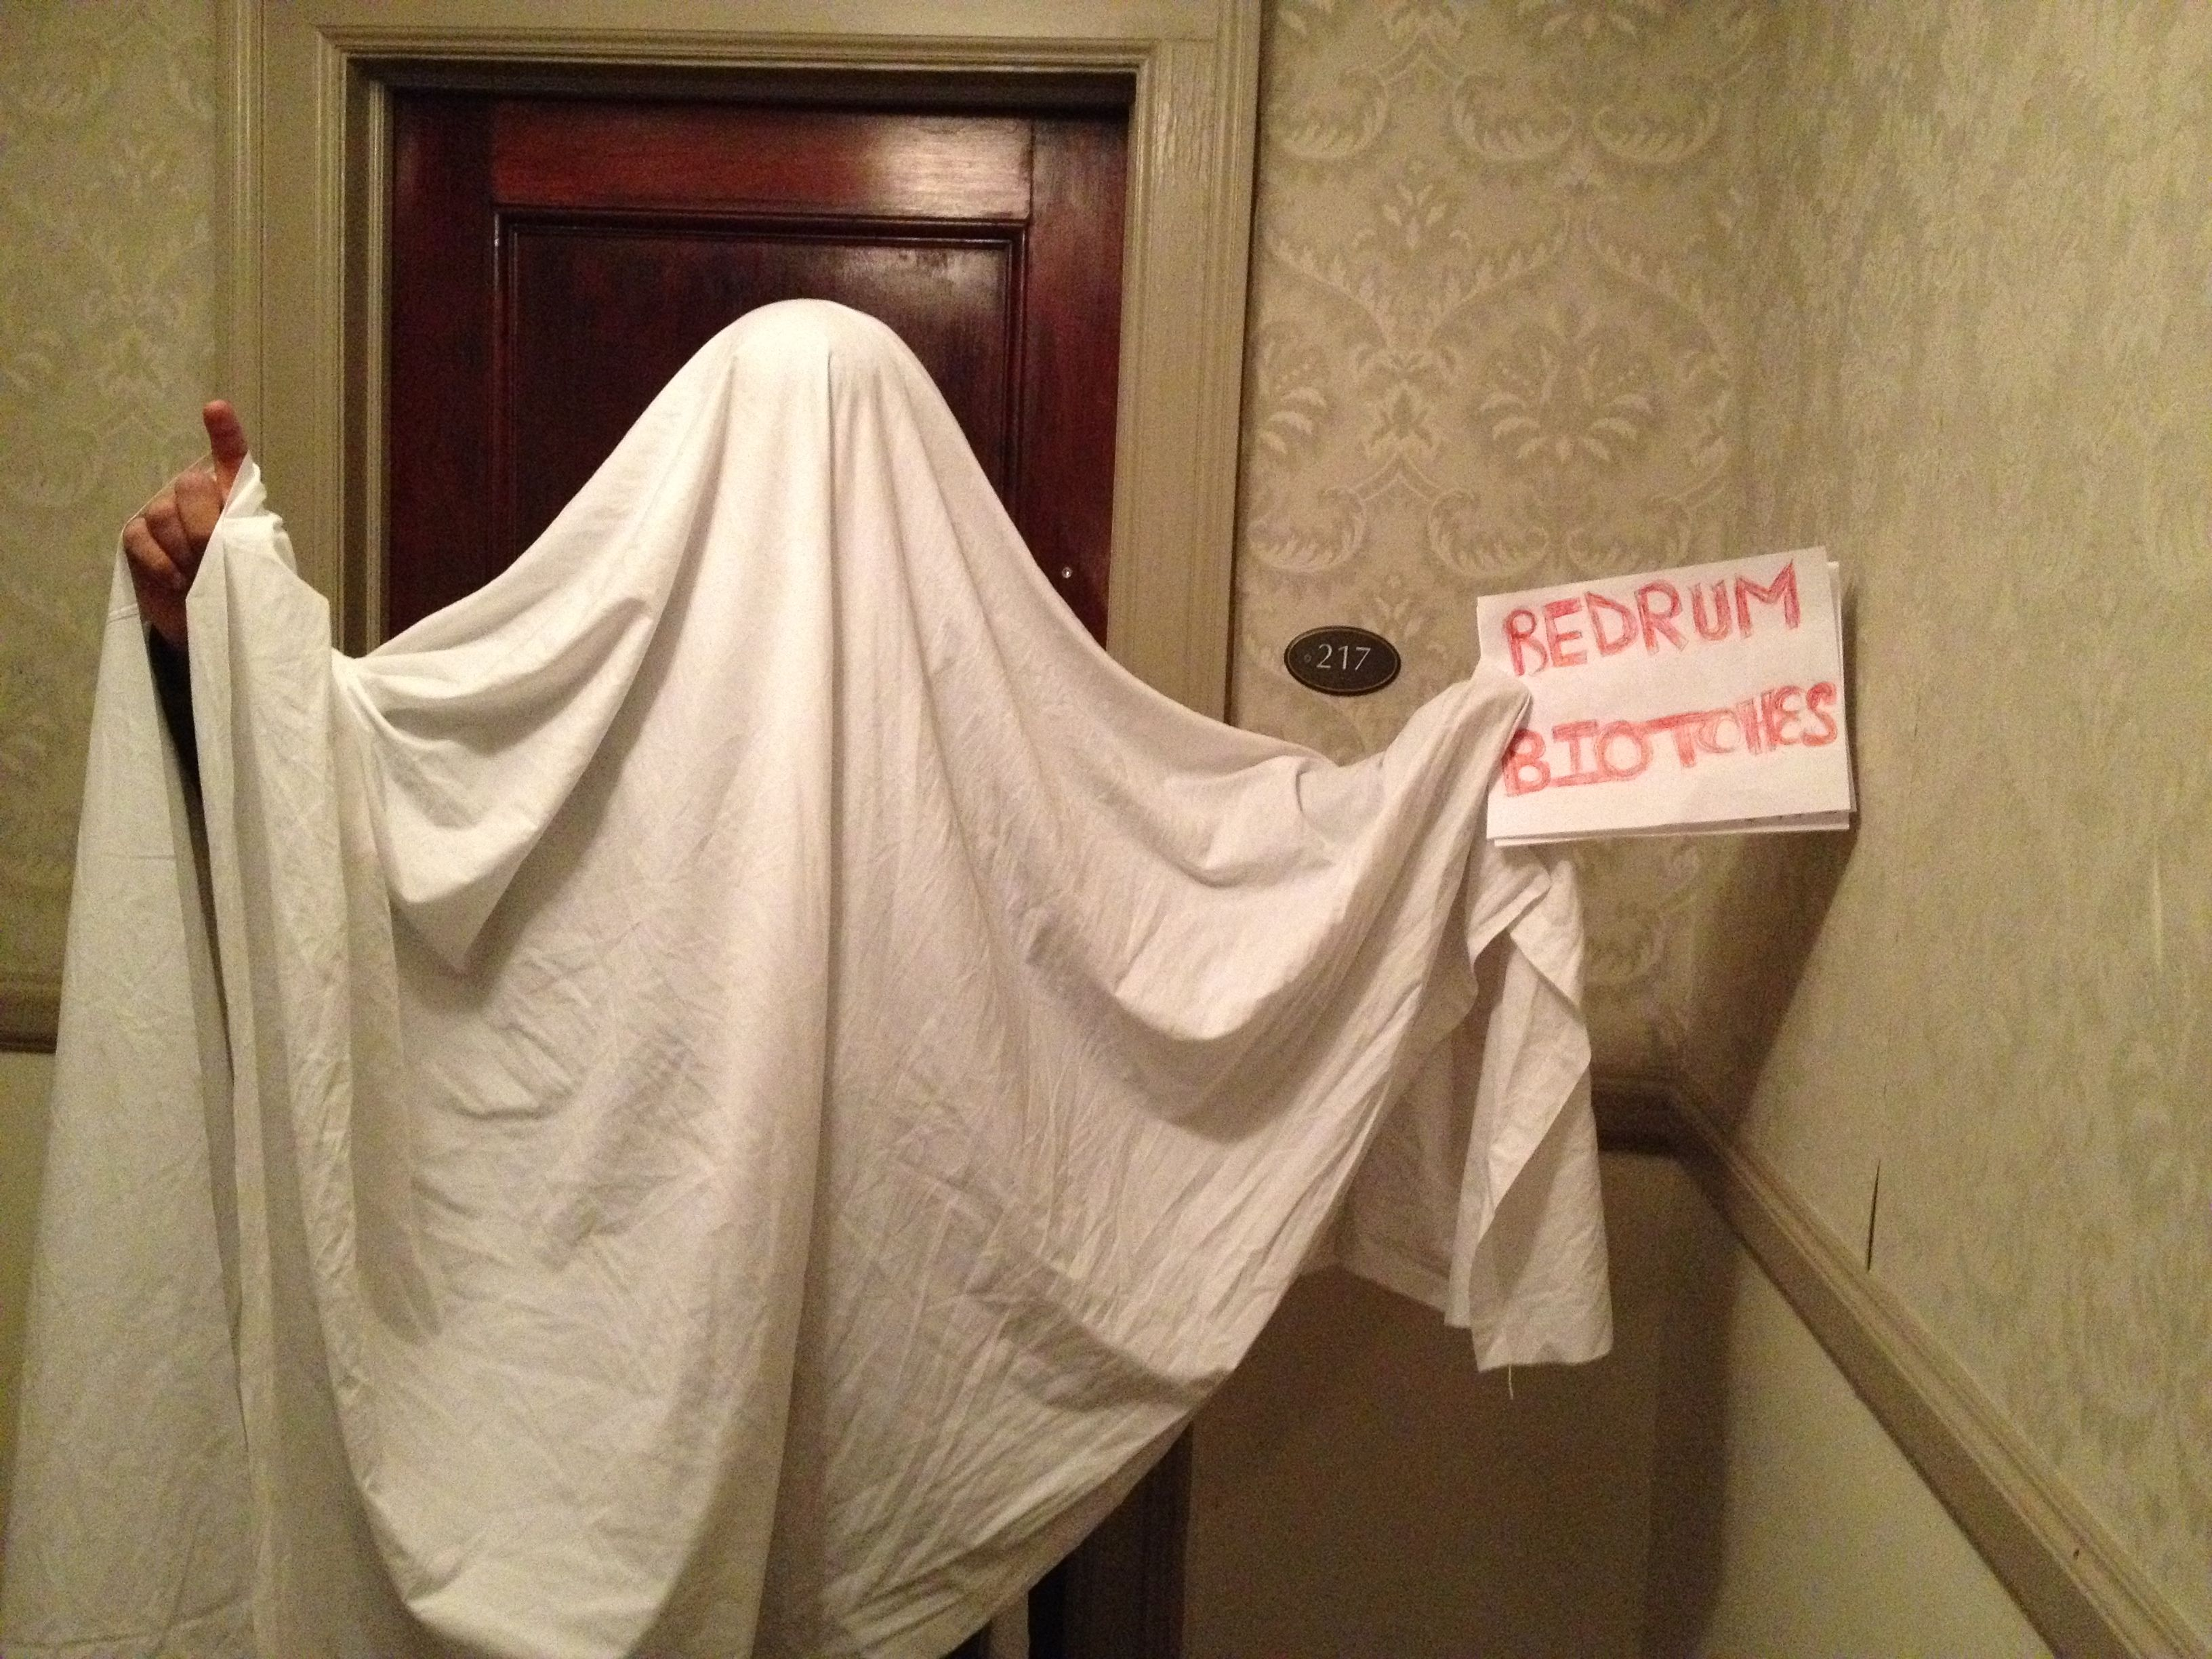 Room 217 Stanley Hotel Ghost